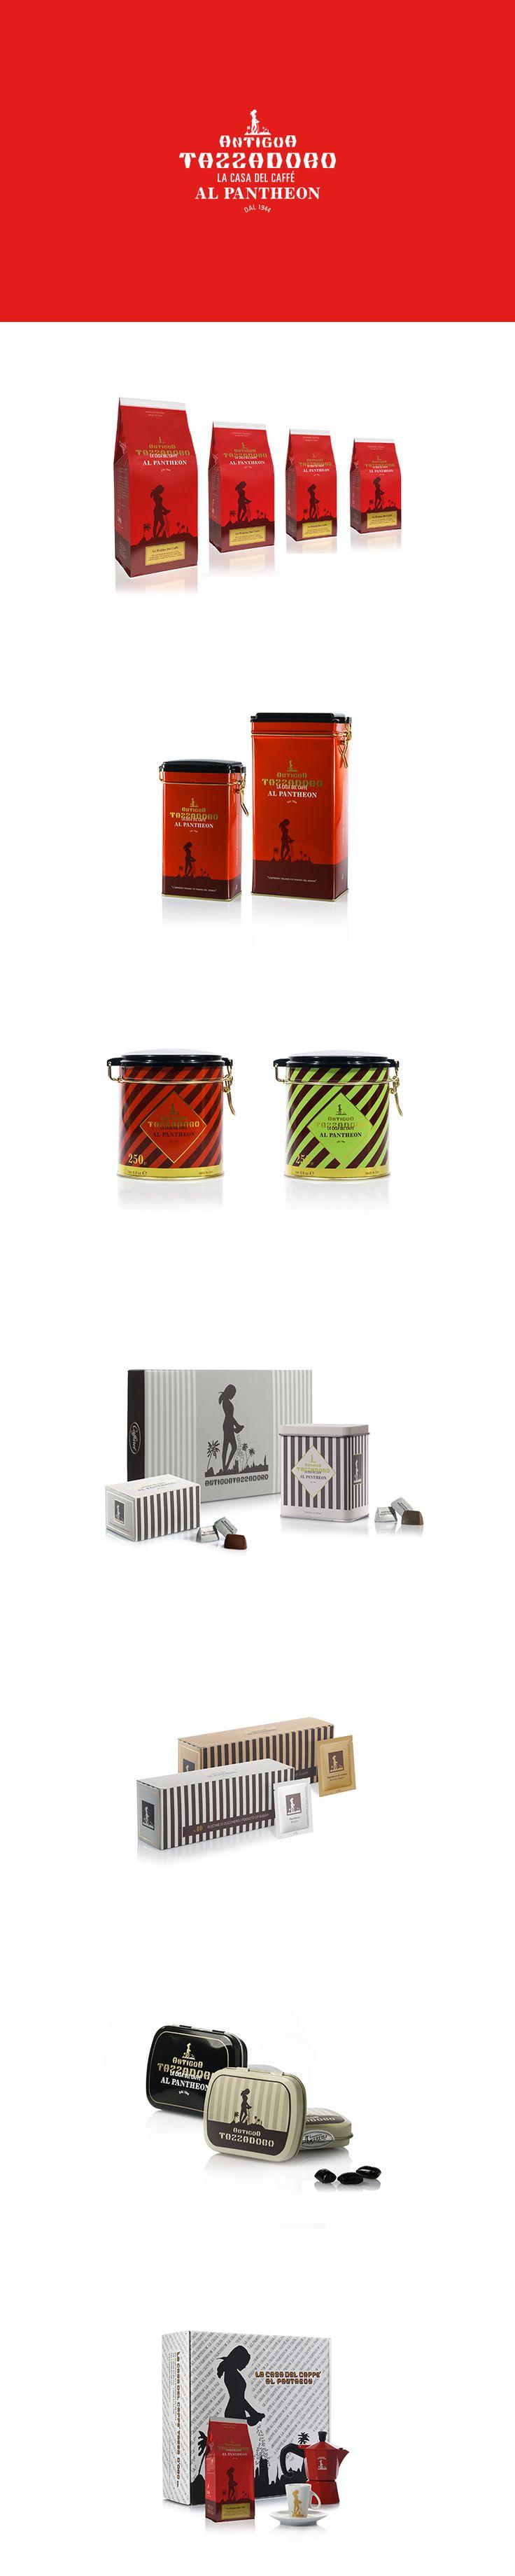 Antigua Tazza D'oro, Packaging Design ─ Giulio Patrizi Design Agency ©   #packaging #coffee #design